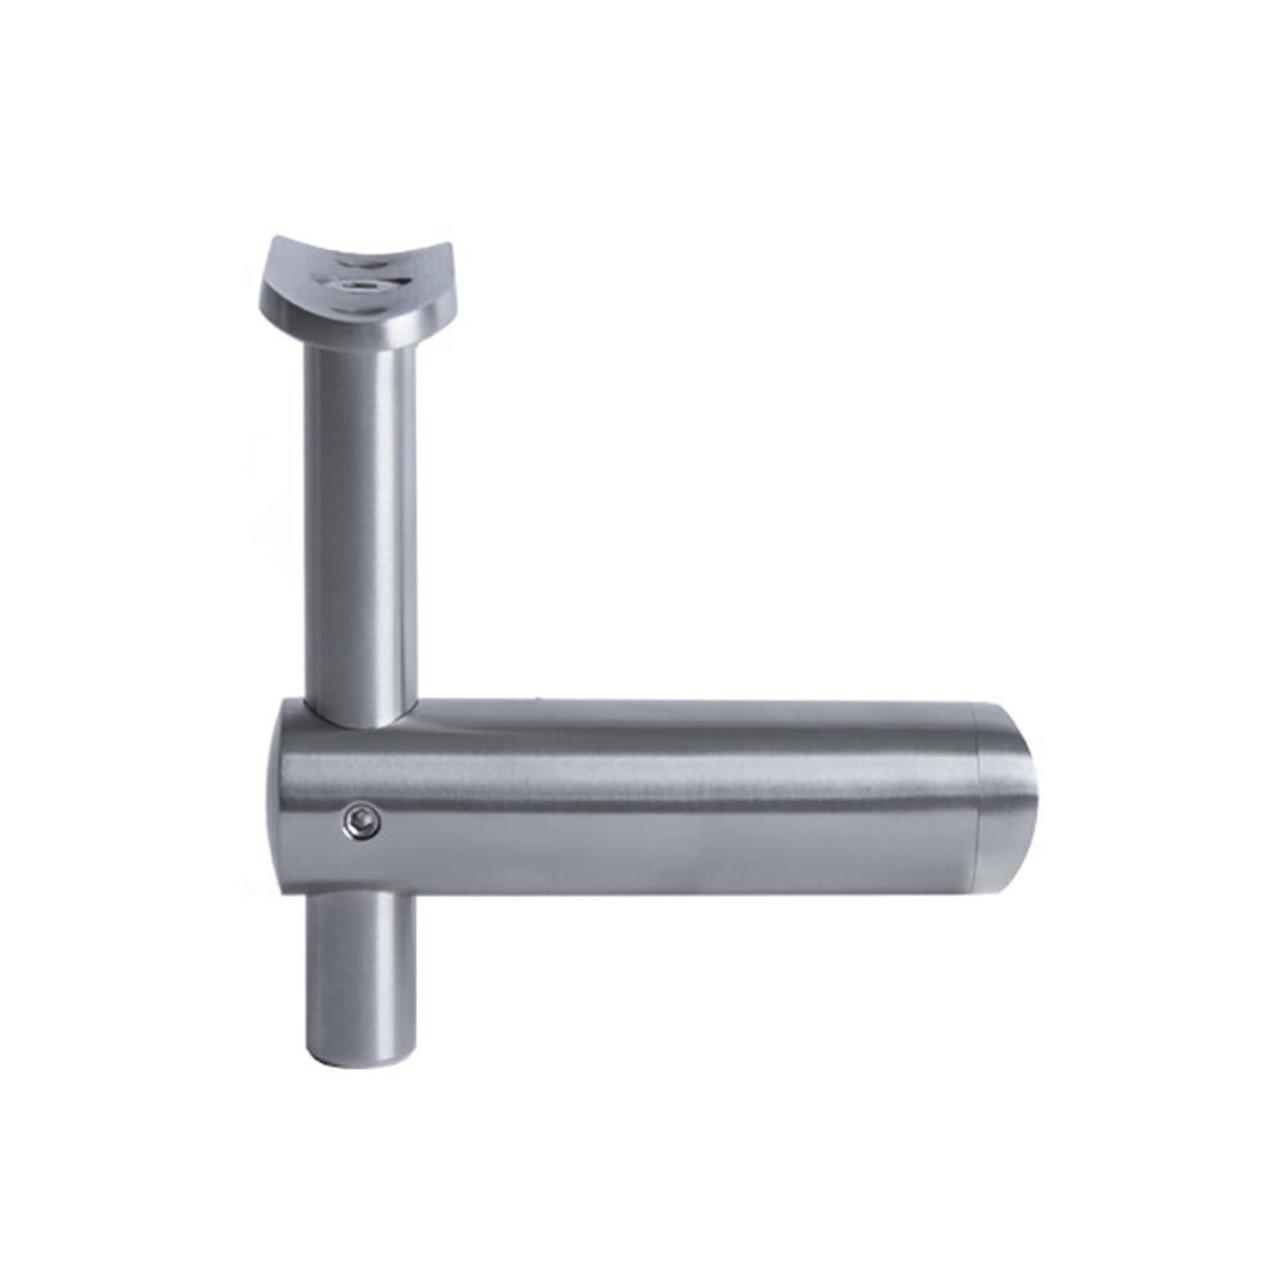 Post Handrail Support Bracket for 42.4 mm Round Rail